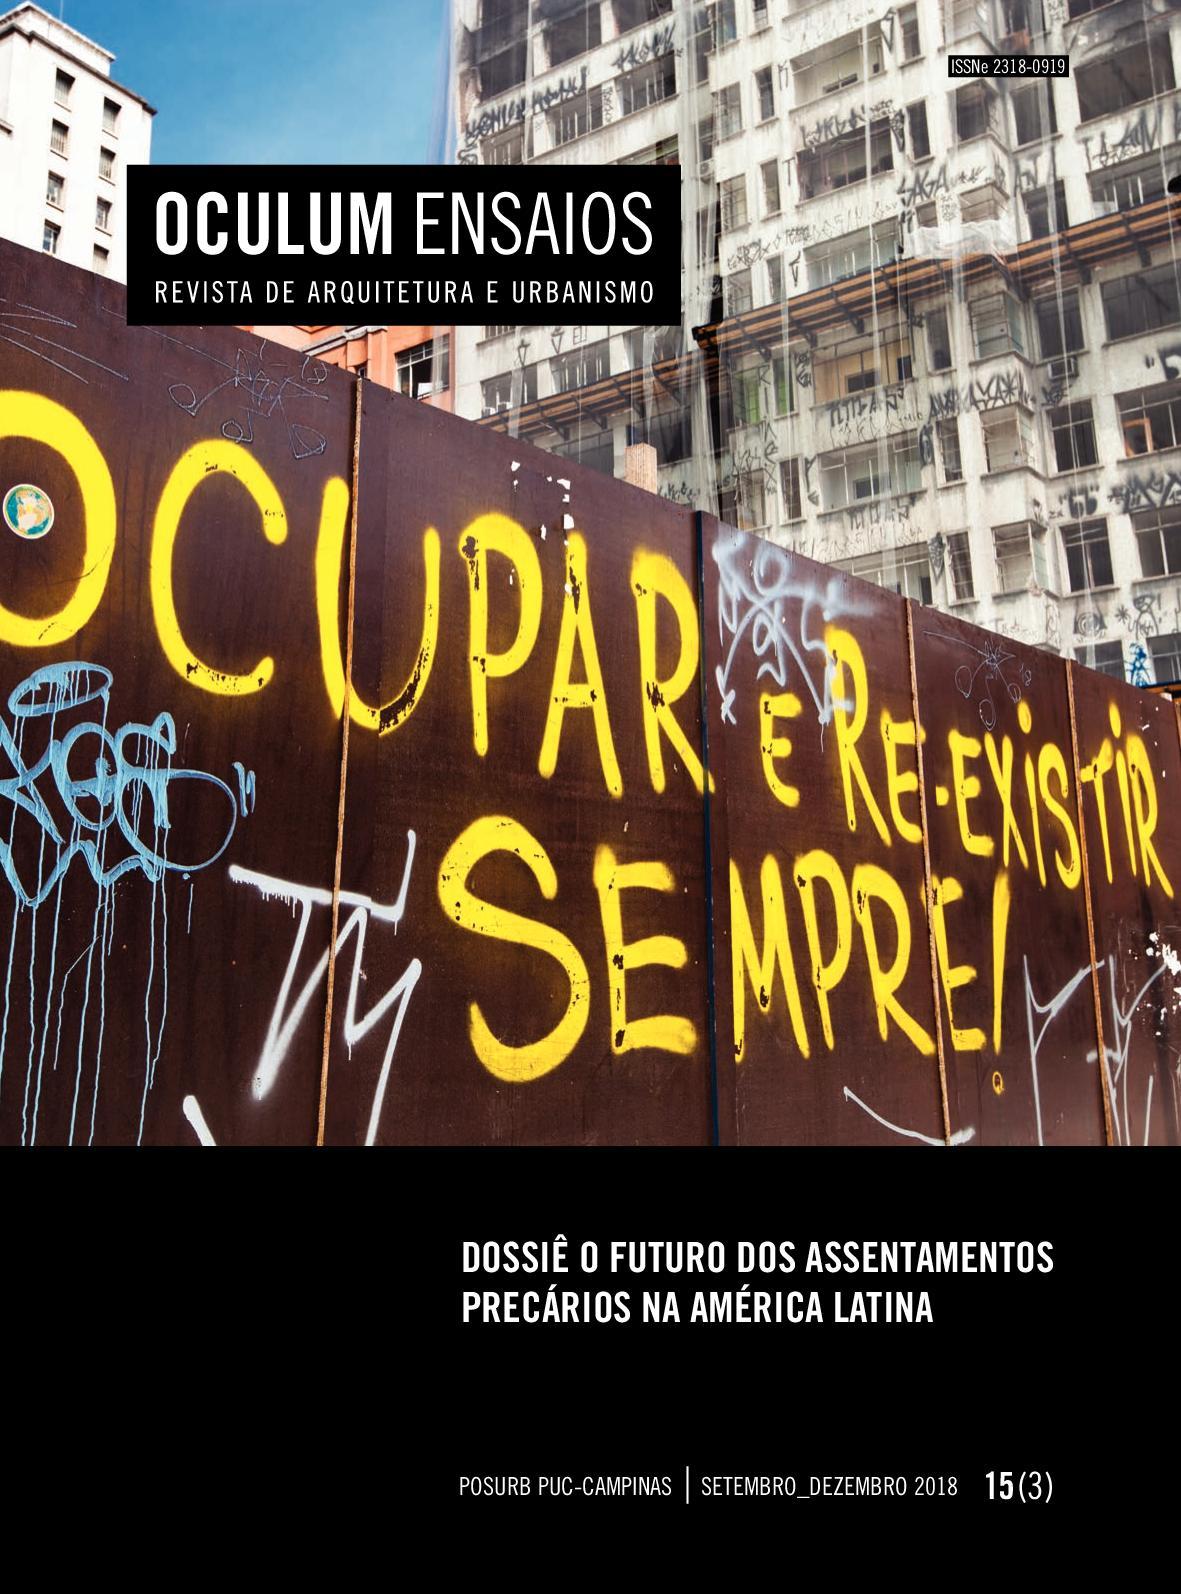 Calaméo Oculum N153 Completa Final